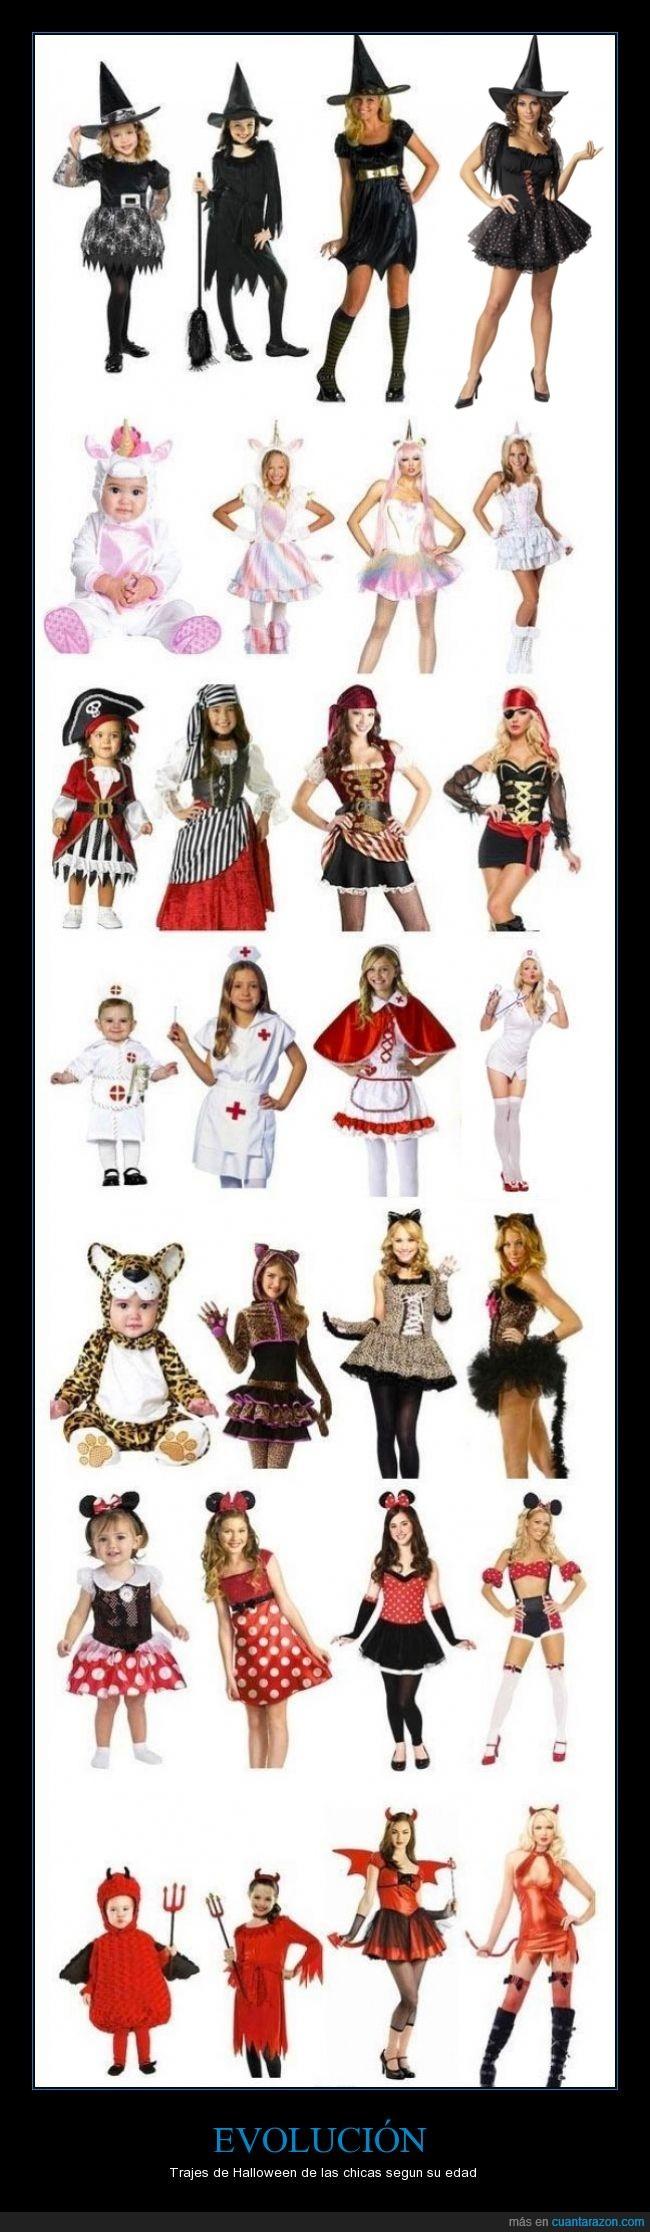 bruja,diabla,disfraz,enseñar,halloween,mujeres,pirata,unicornio